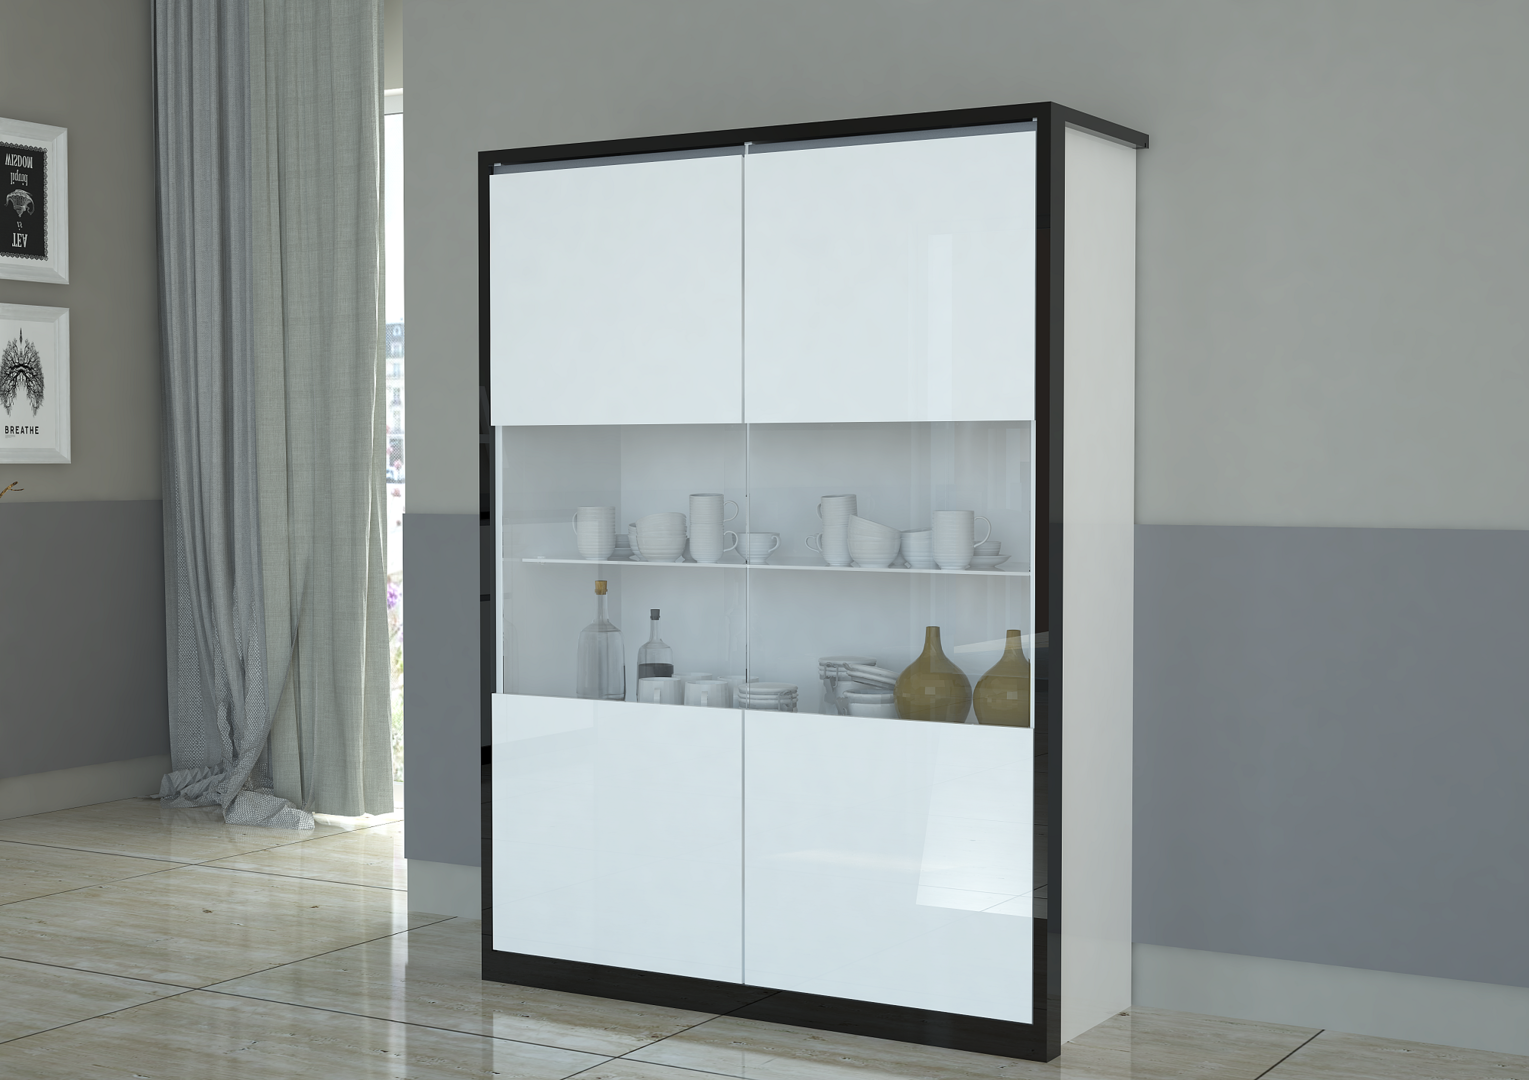 Credenza Con Vetrina Moderna : Vetrina moderna avana credenza bianca mobile soggiorno design